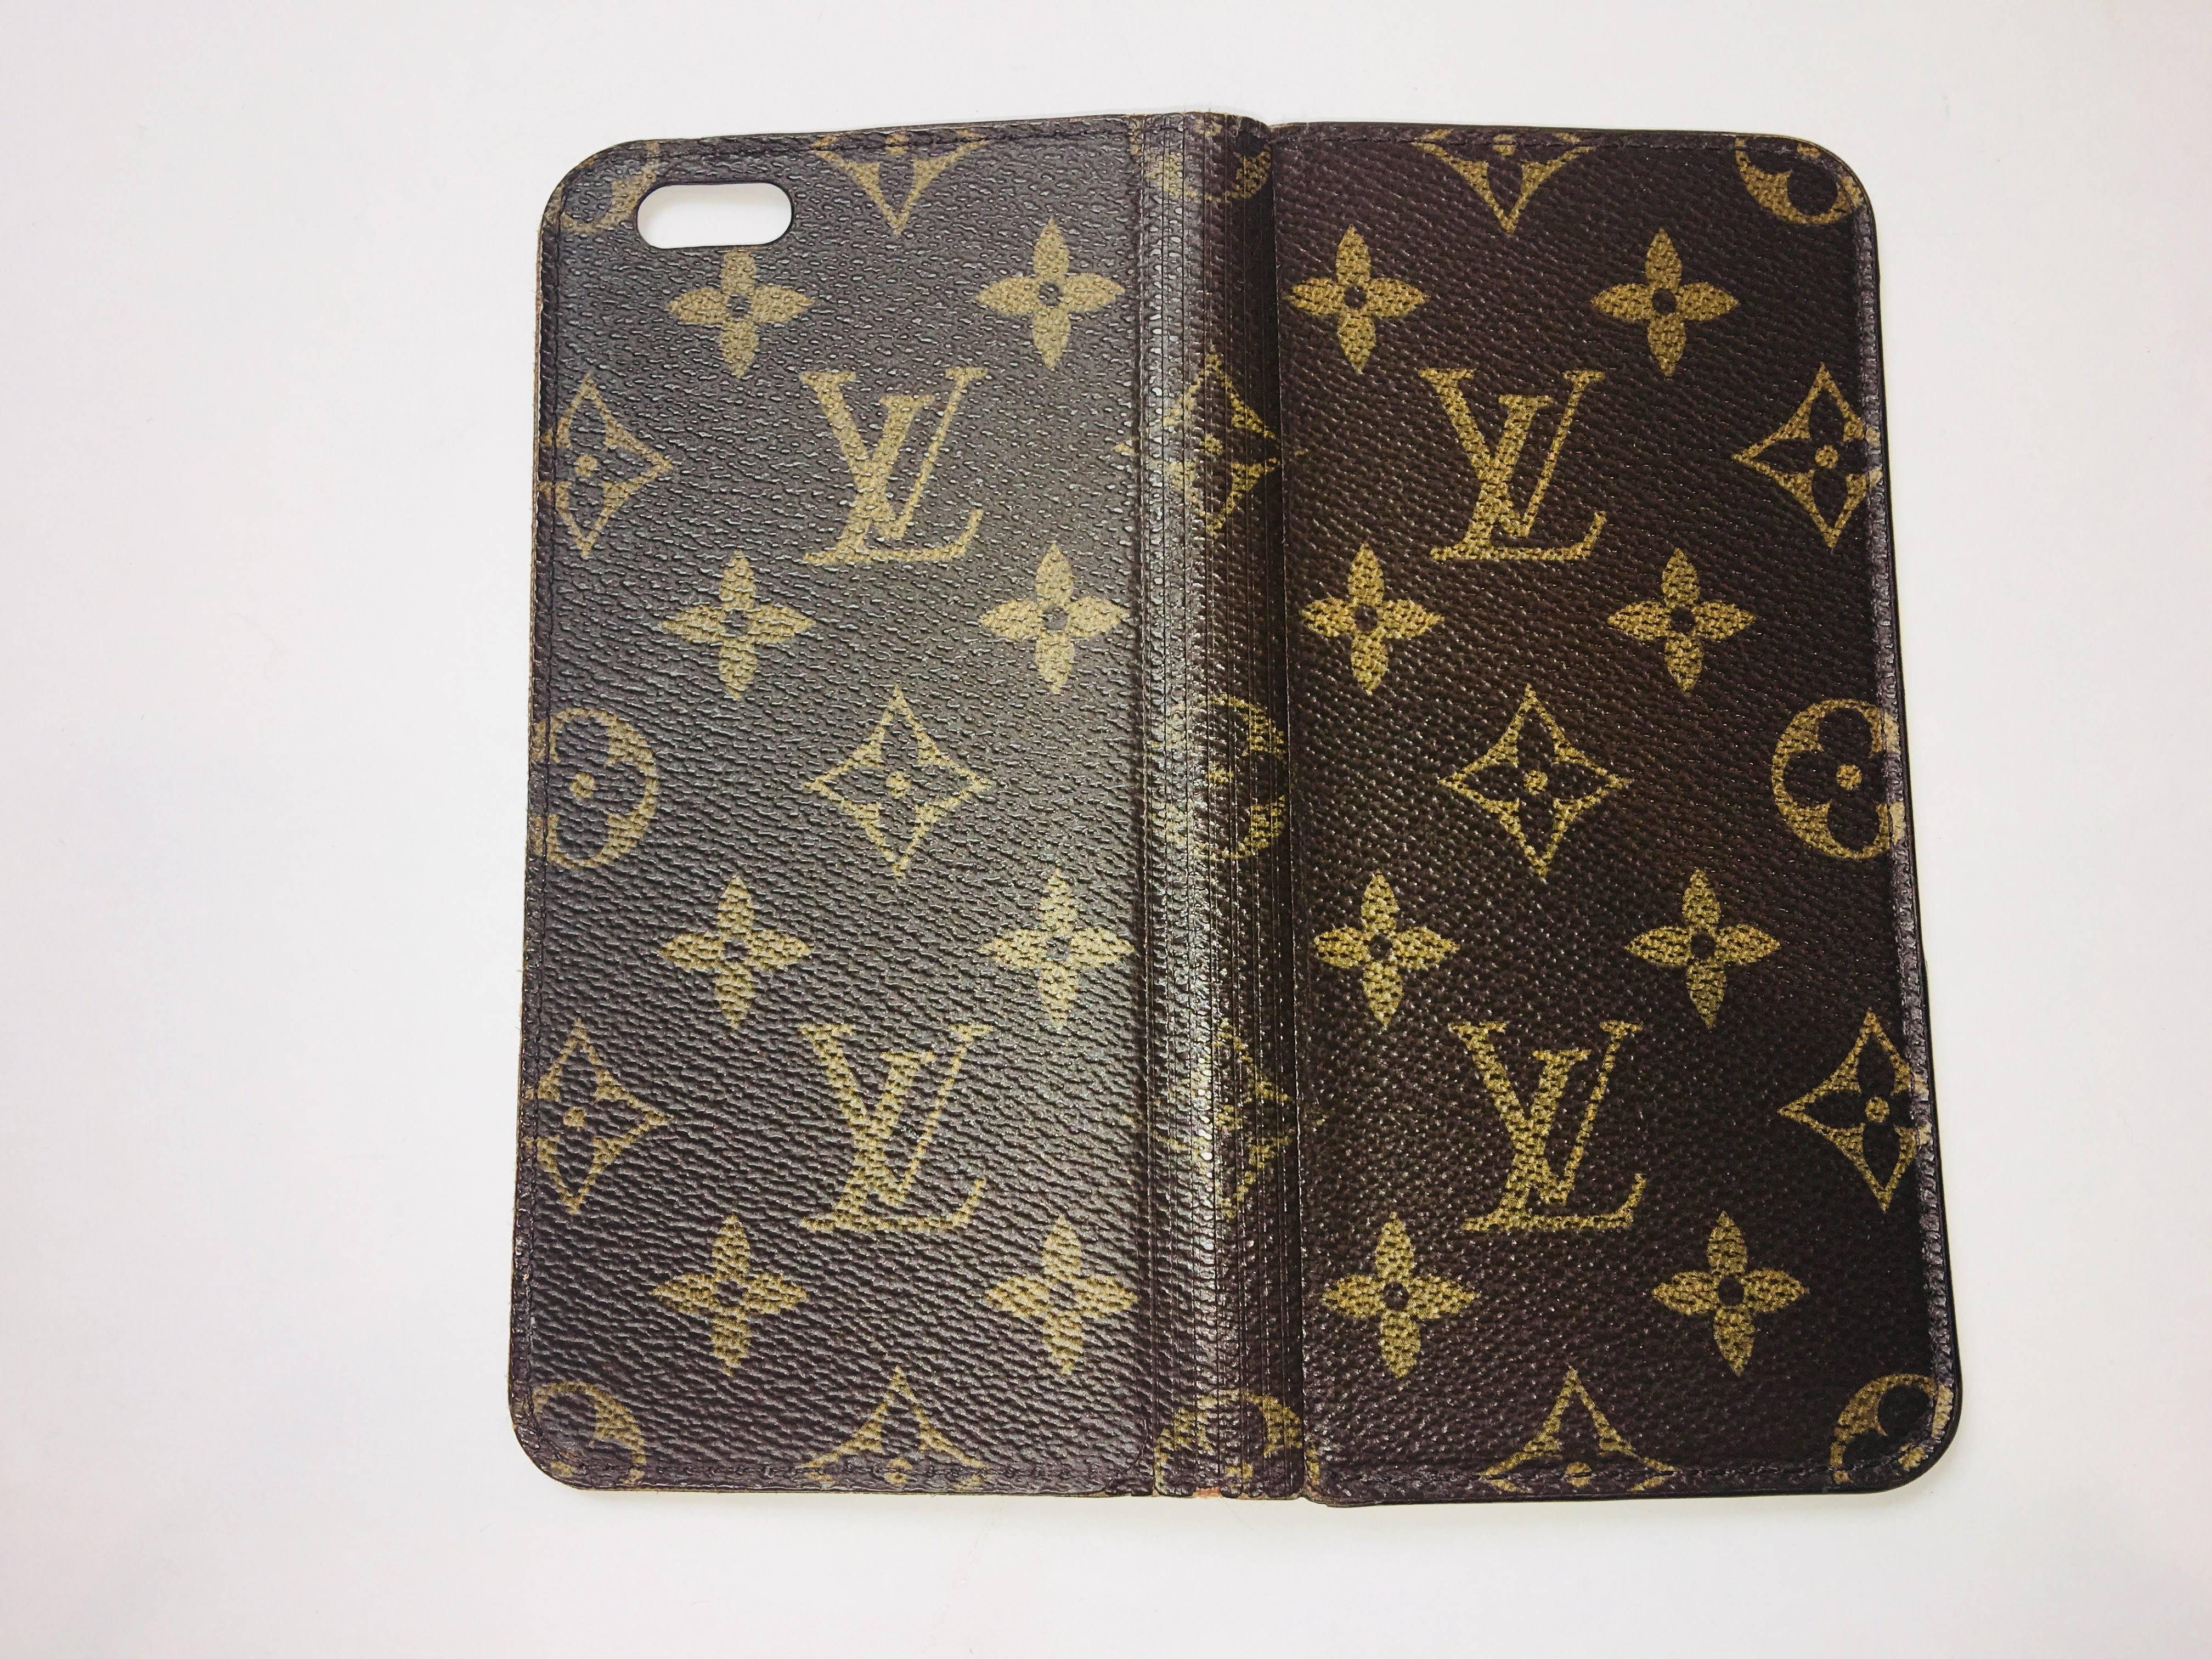 timeless design 3bfdc 133c2 Louis Vuitton Phone Case